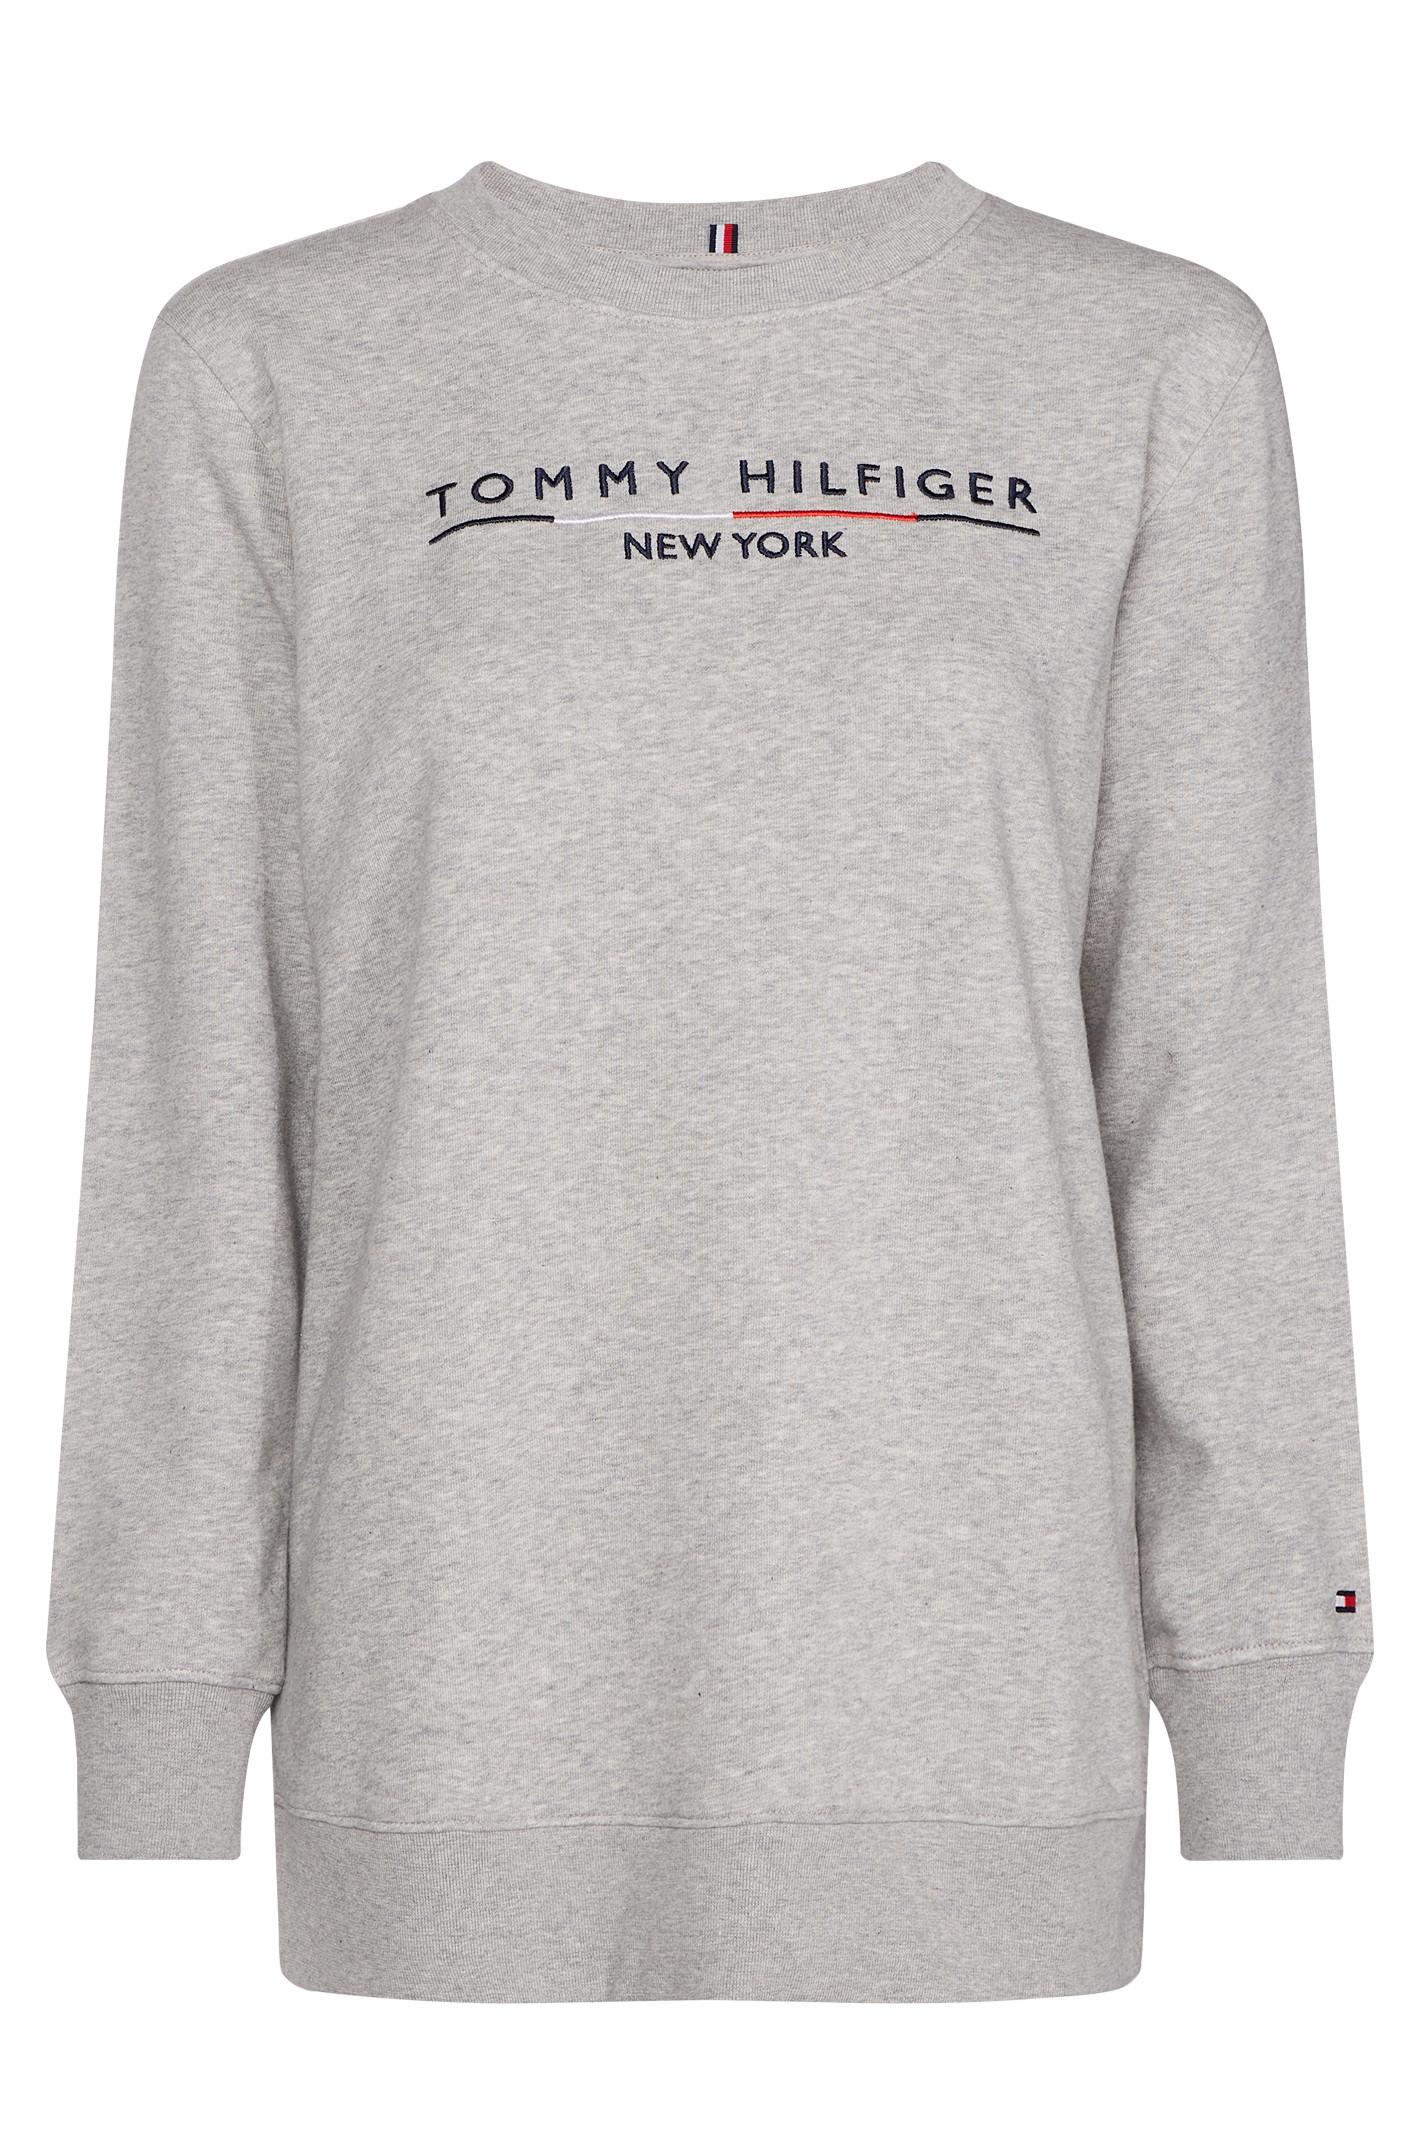 TOMMY HILFIGER CHARLOT C-NK 25164 GRÅ